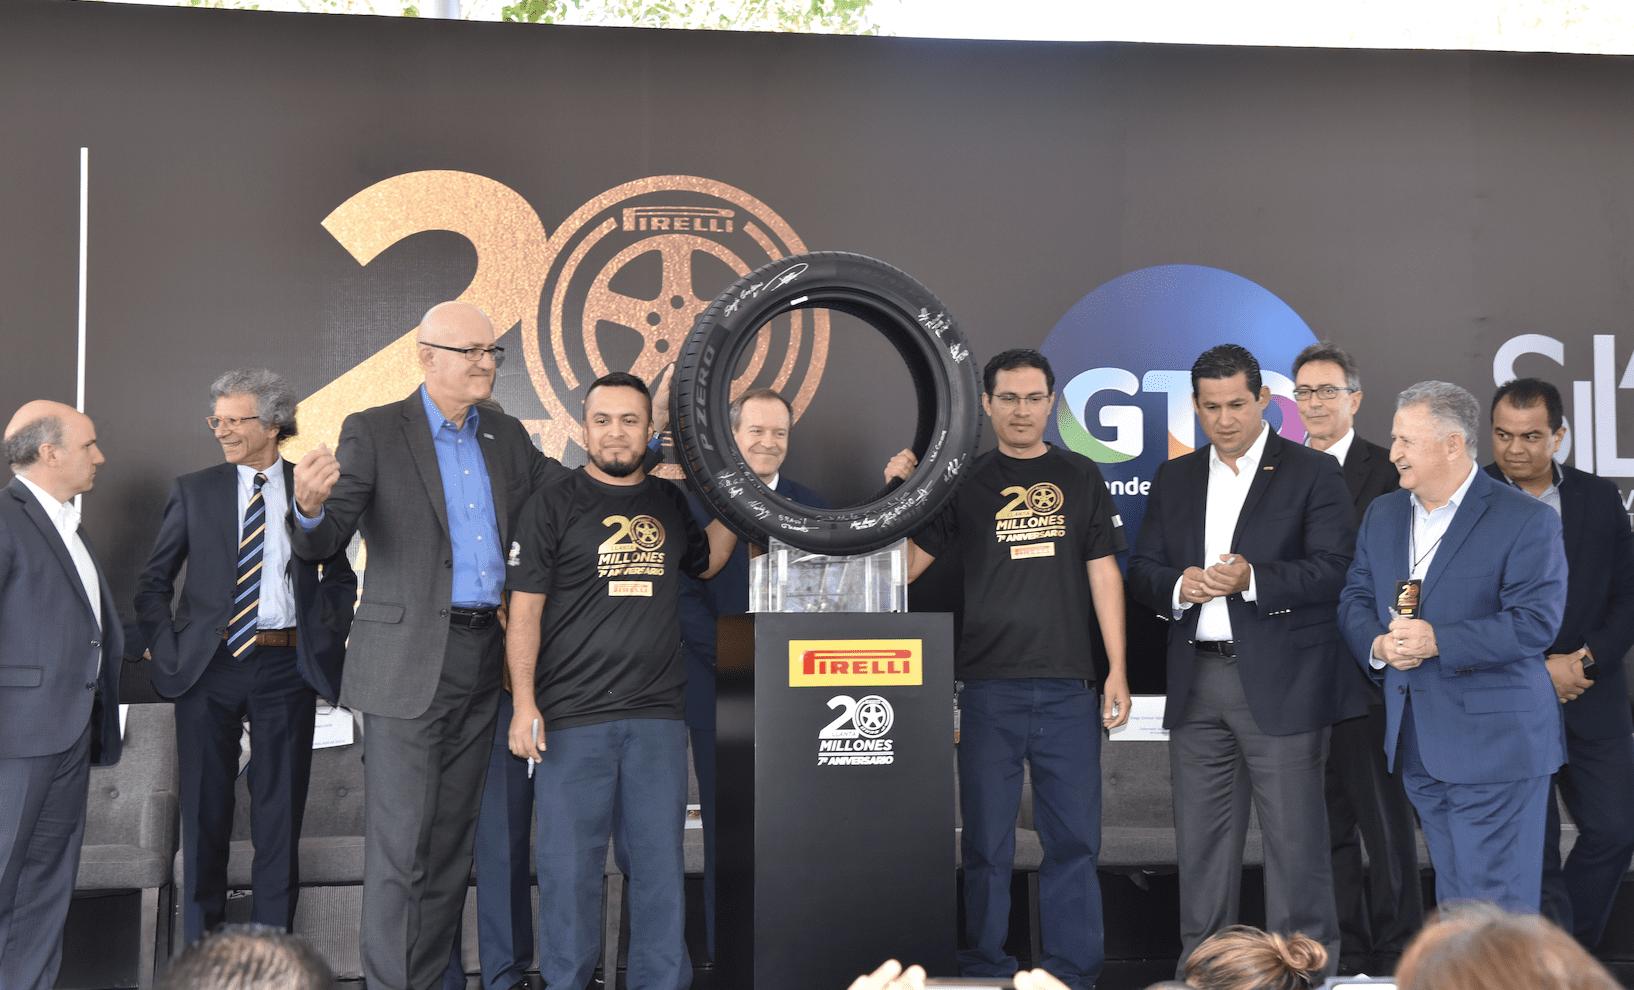 Llega Pirelli México a 20 millones de llantas producidas